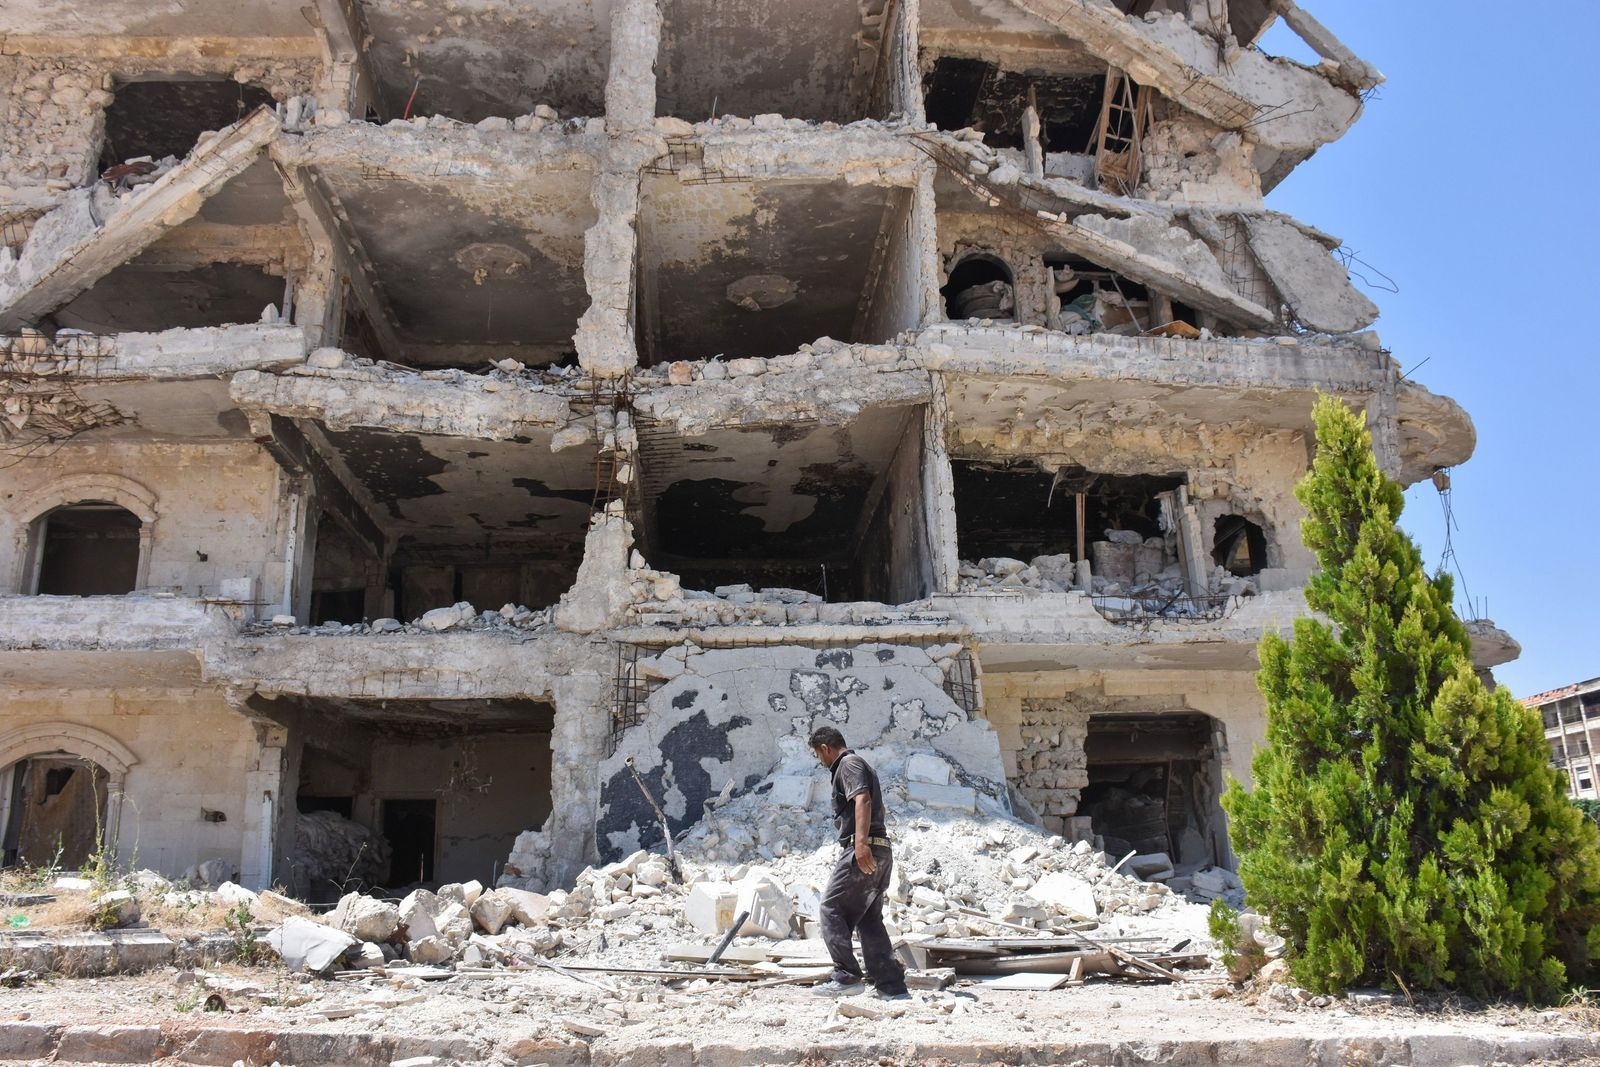 SYRIA-CONFLICT-POLITICS-RECONSTRUCTION